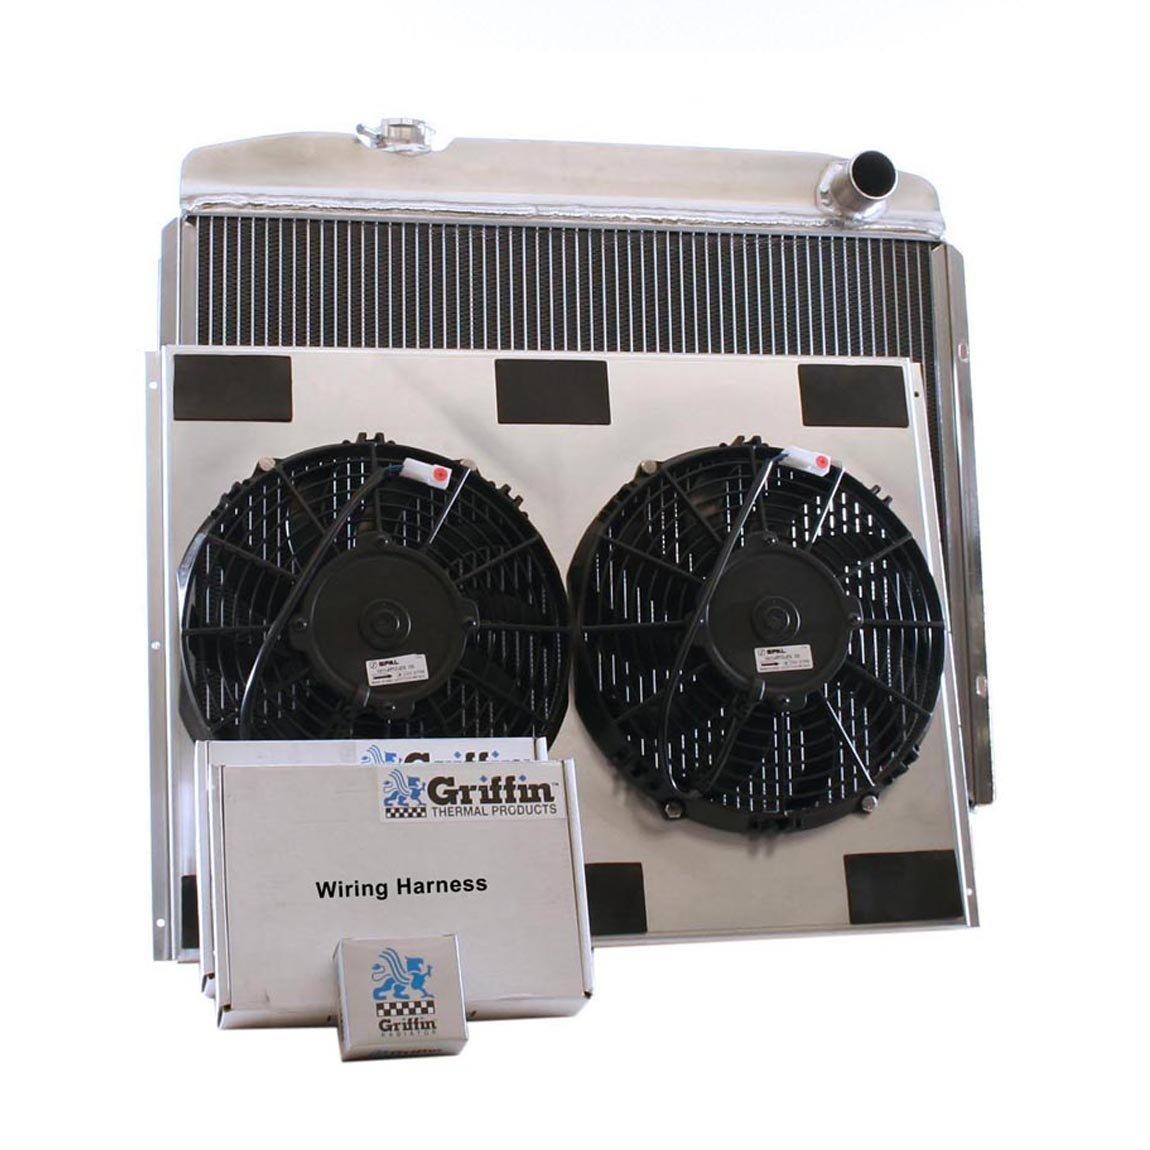 Griffin Radiator CU-00050 ComboUnit Radiator and Electric Fan Kit